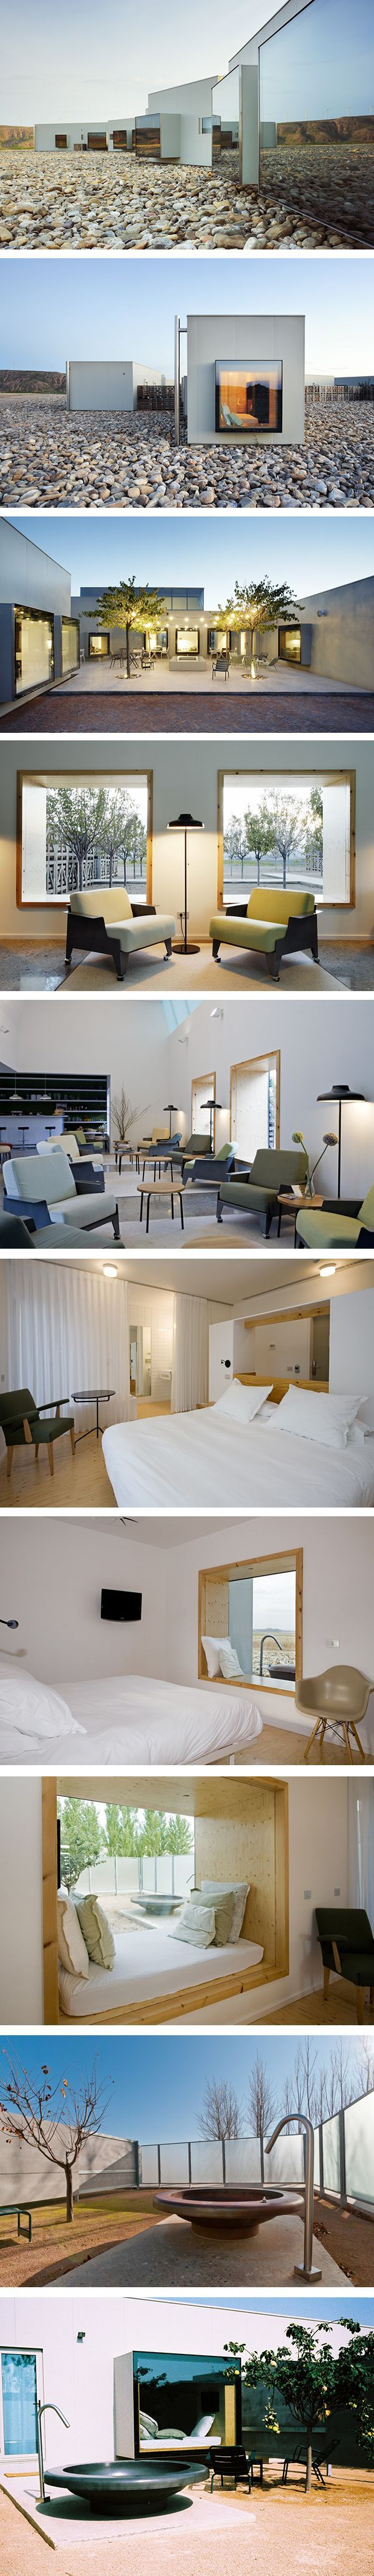 Beautiful #Fotel #Architecture Details @ hotel Bárdenas